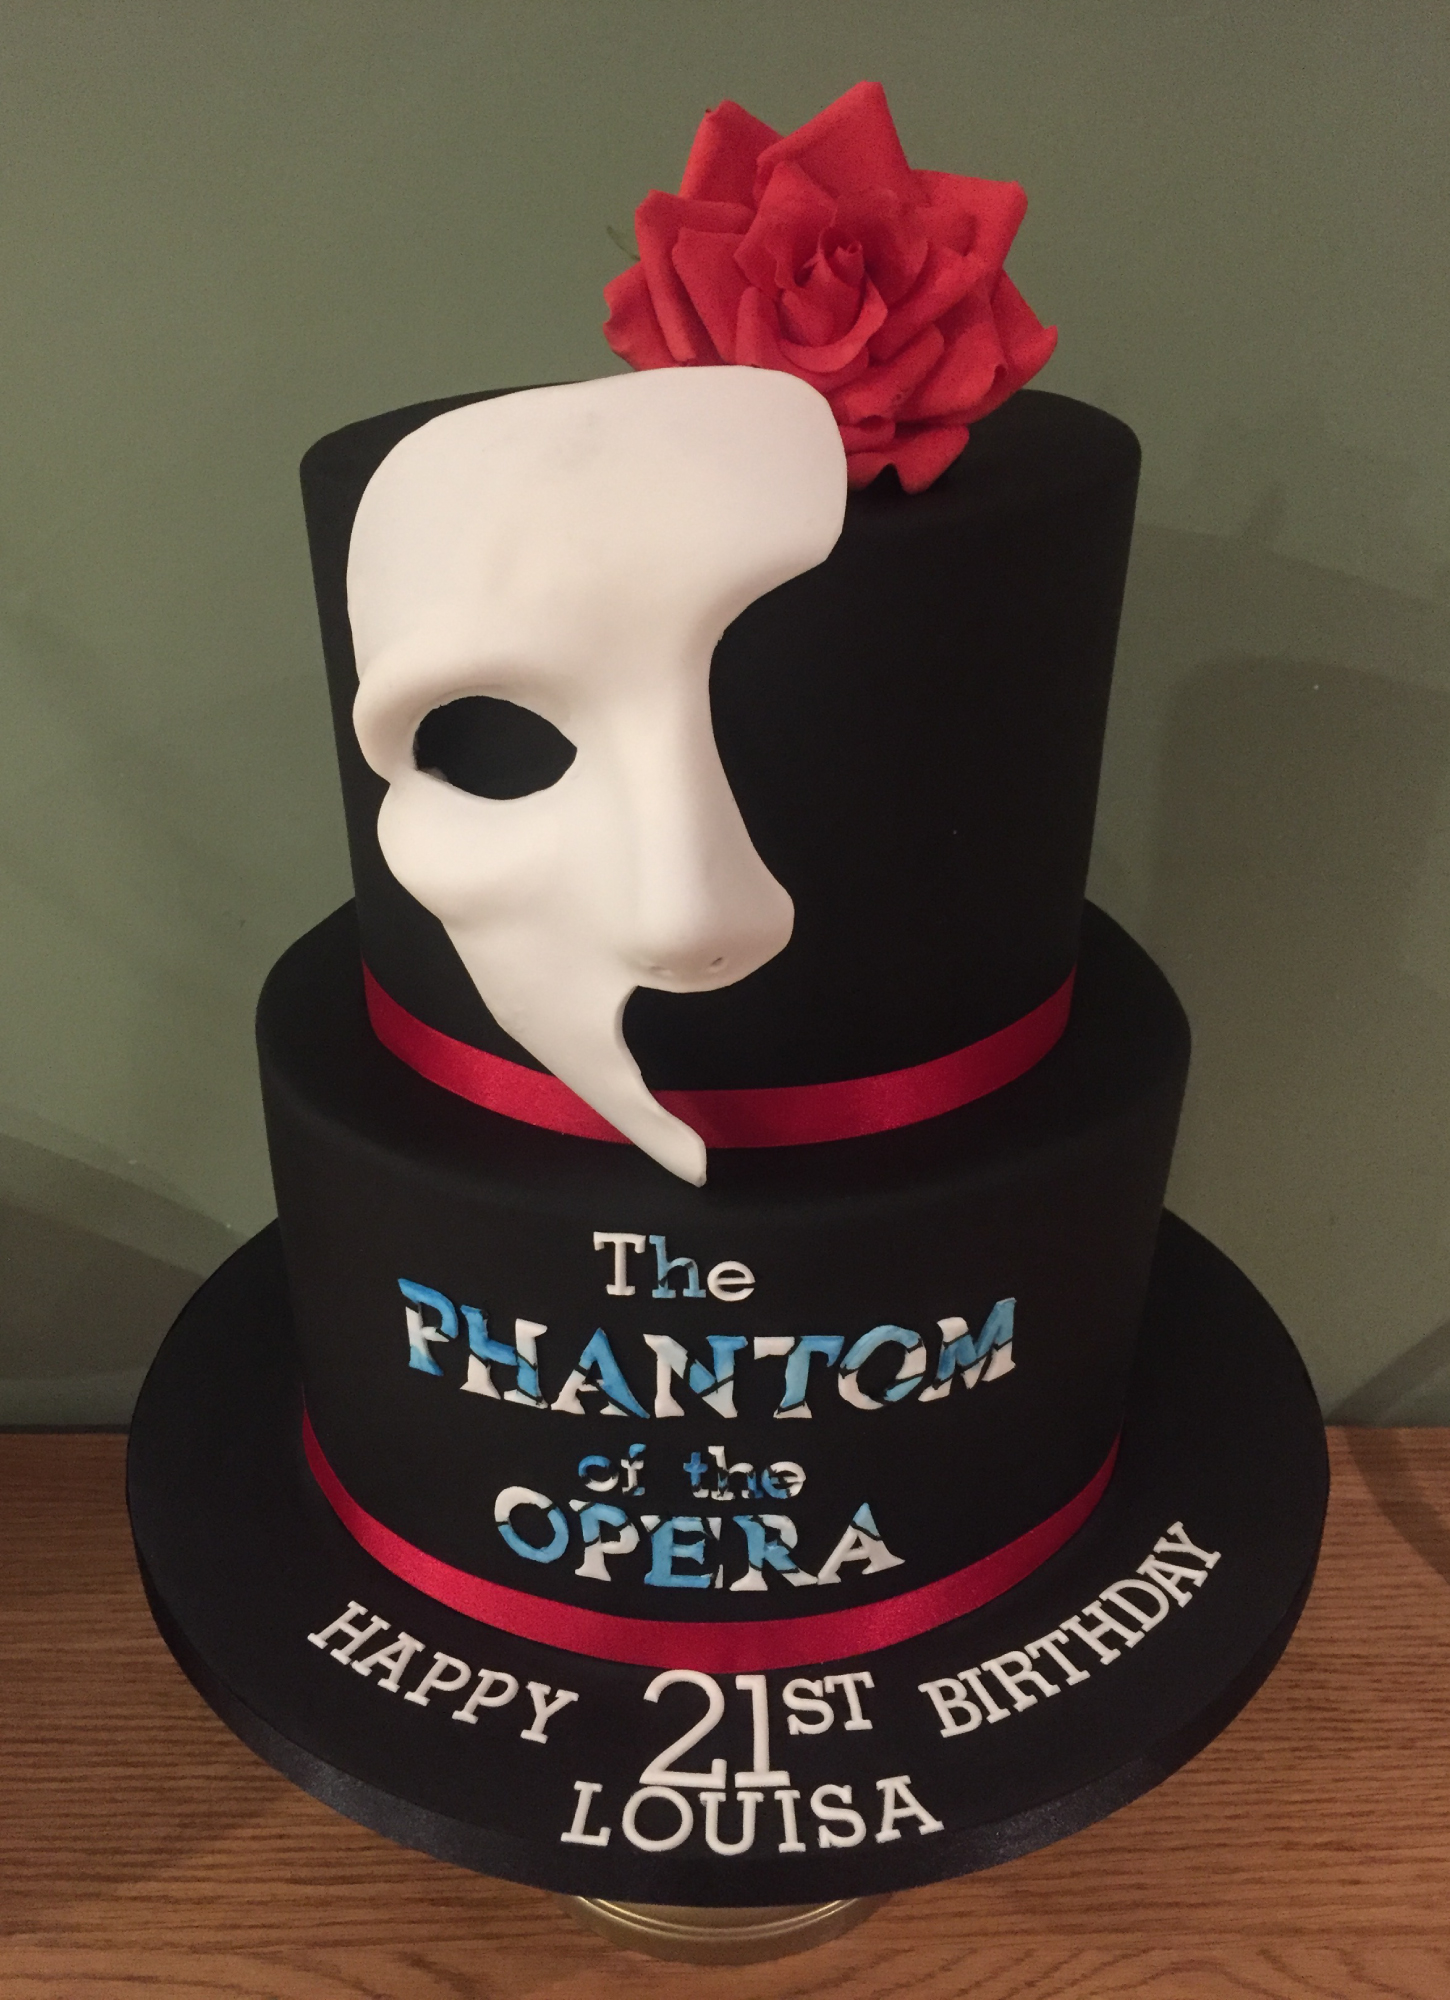 Bespoke 21st Birthday Cake - Pat a Cakes Jersey